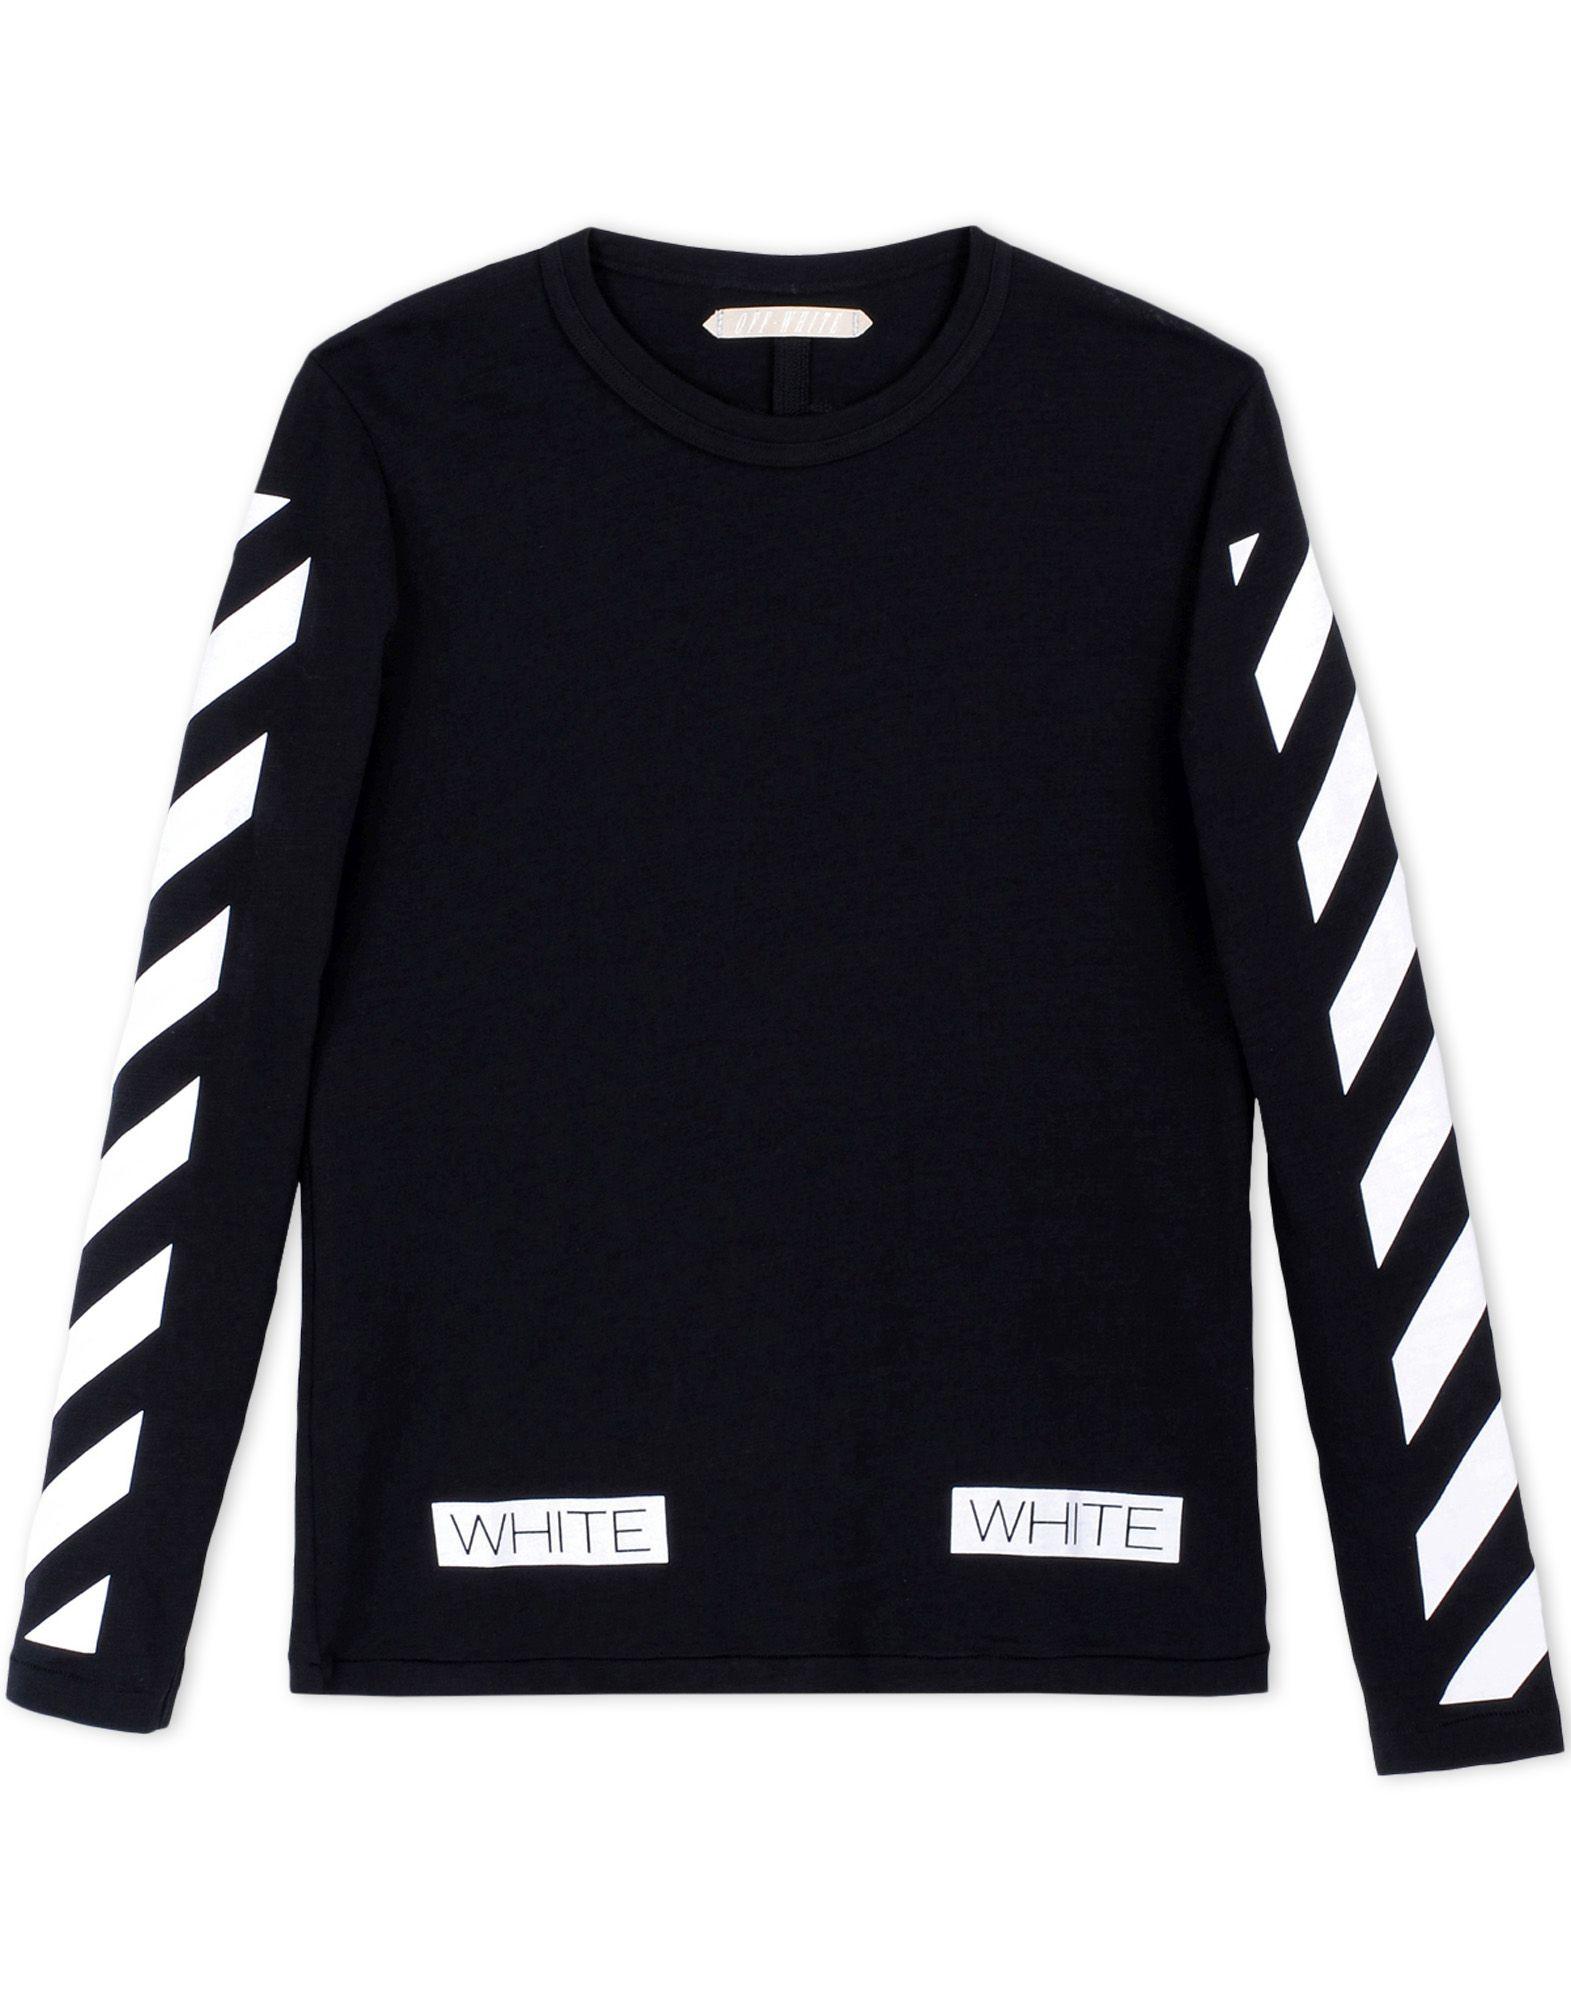 Black White Long Sleeve Shirt | Artee Shirt